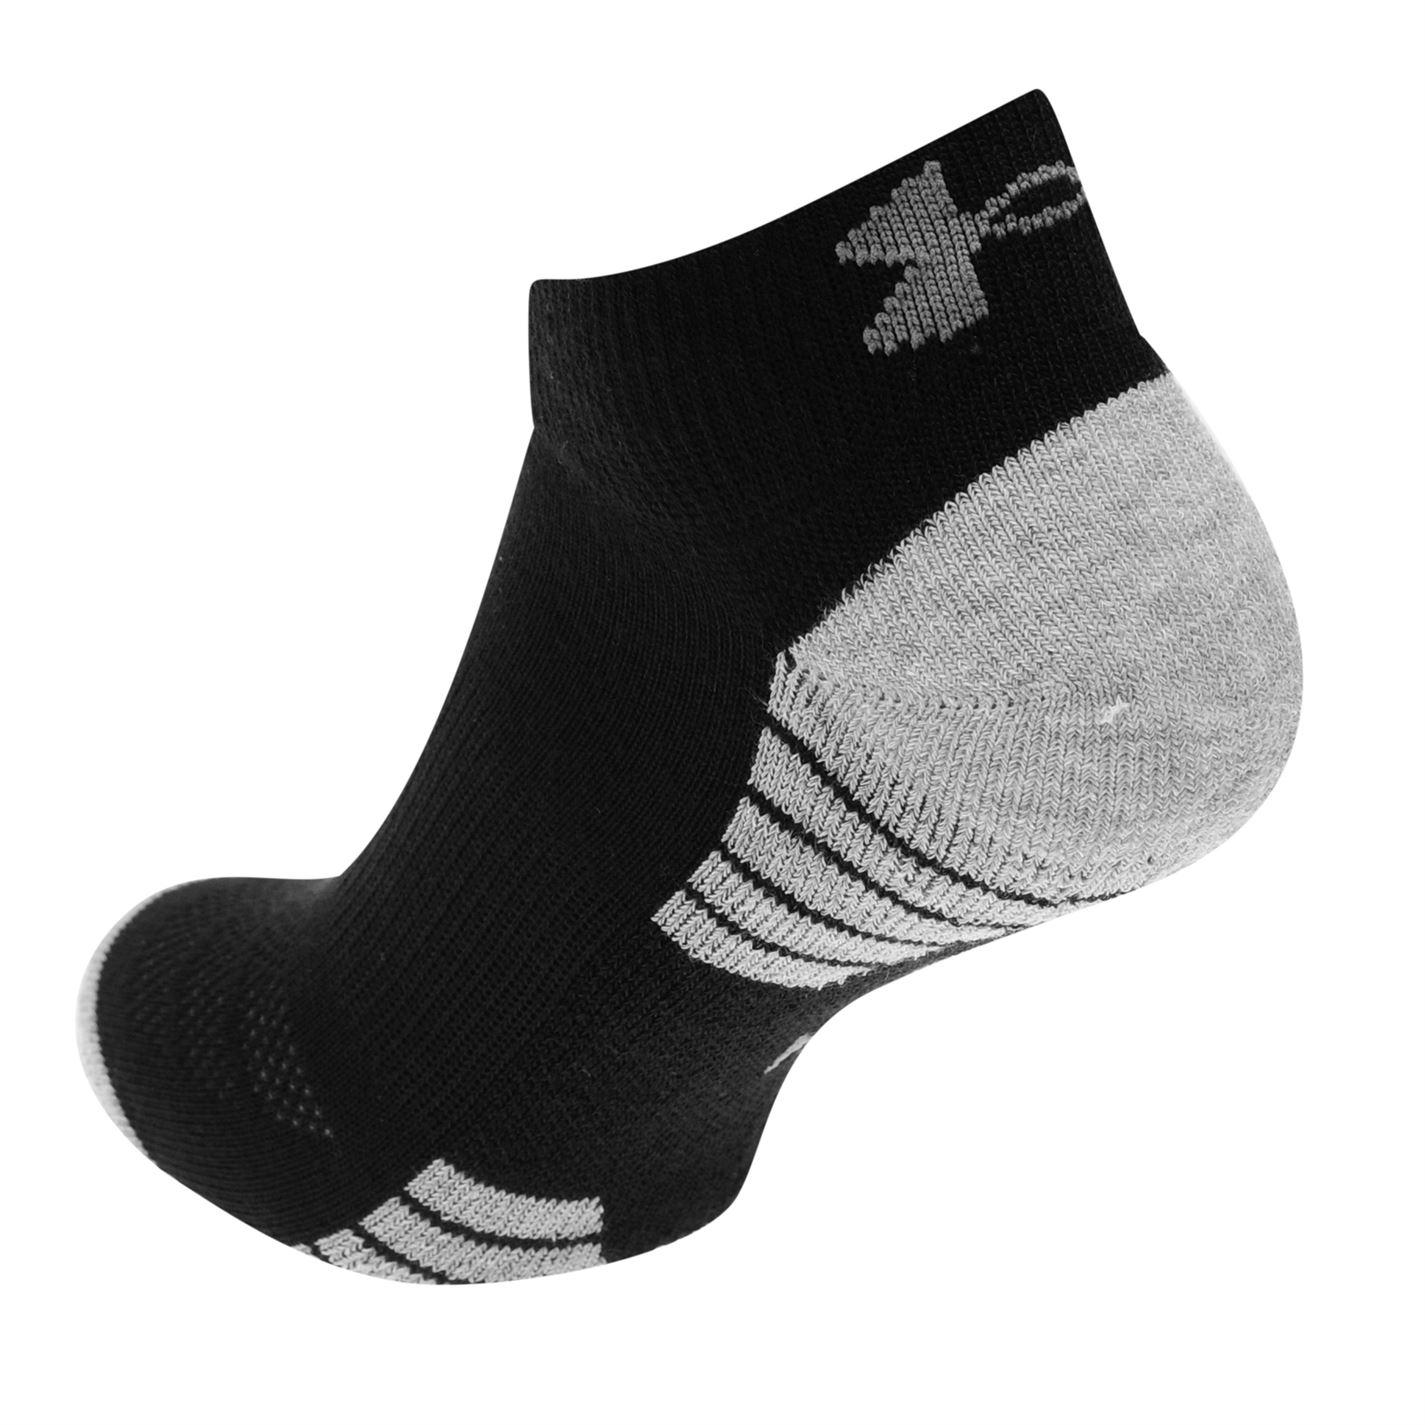 Under Armour Tech quart Pack 3 chaussettes Homme Gents Moisture Wicking Sport